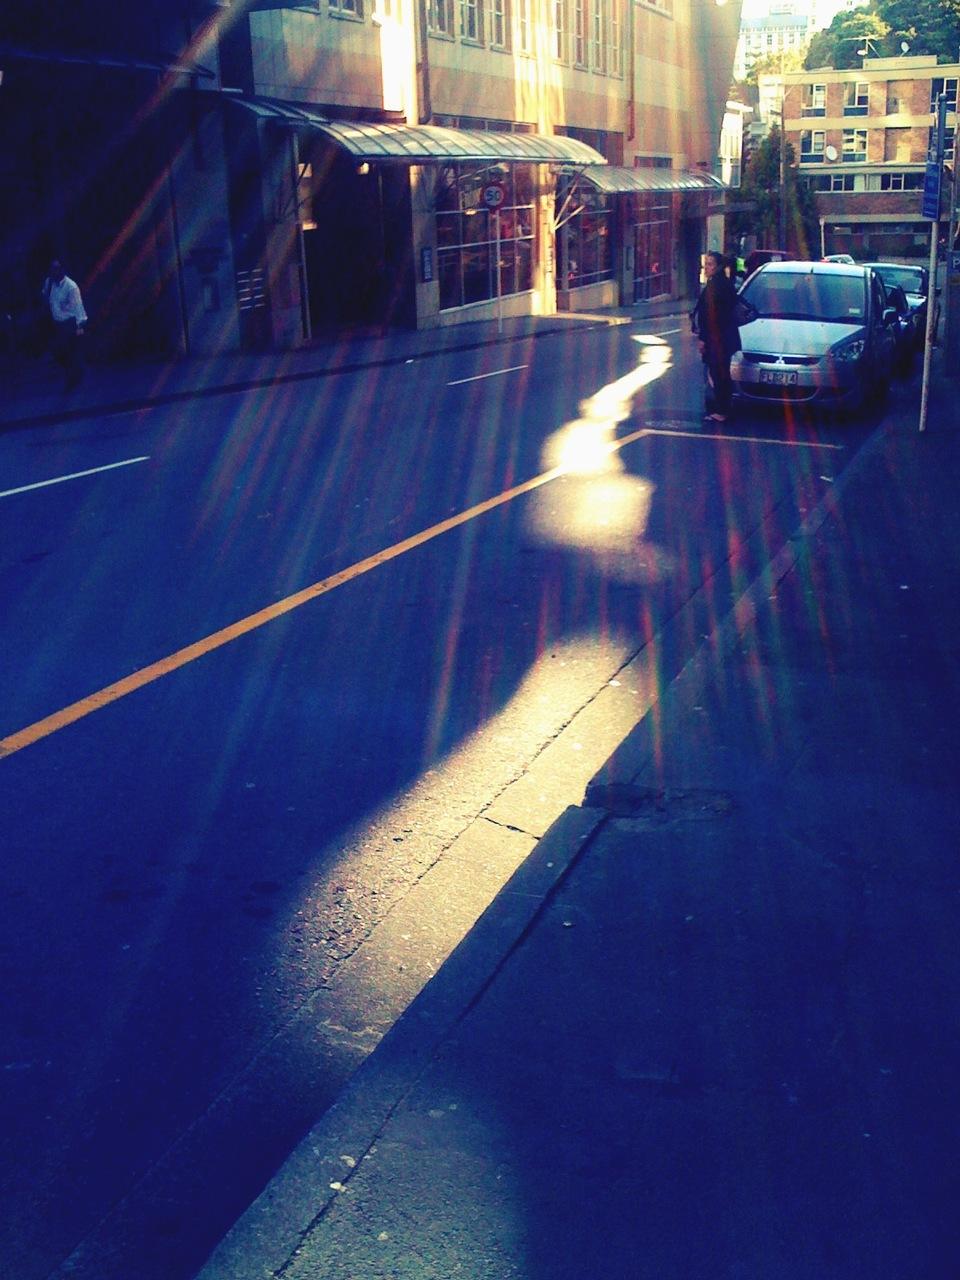 Late sun reflecting on Boulcott St, 5 Oct '10.